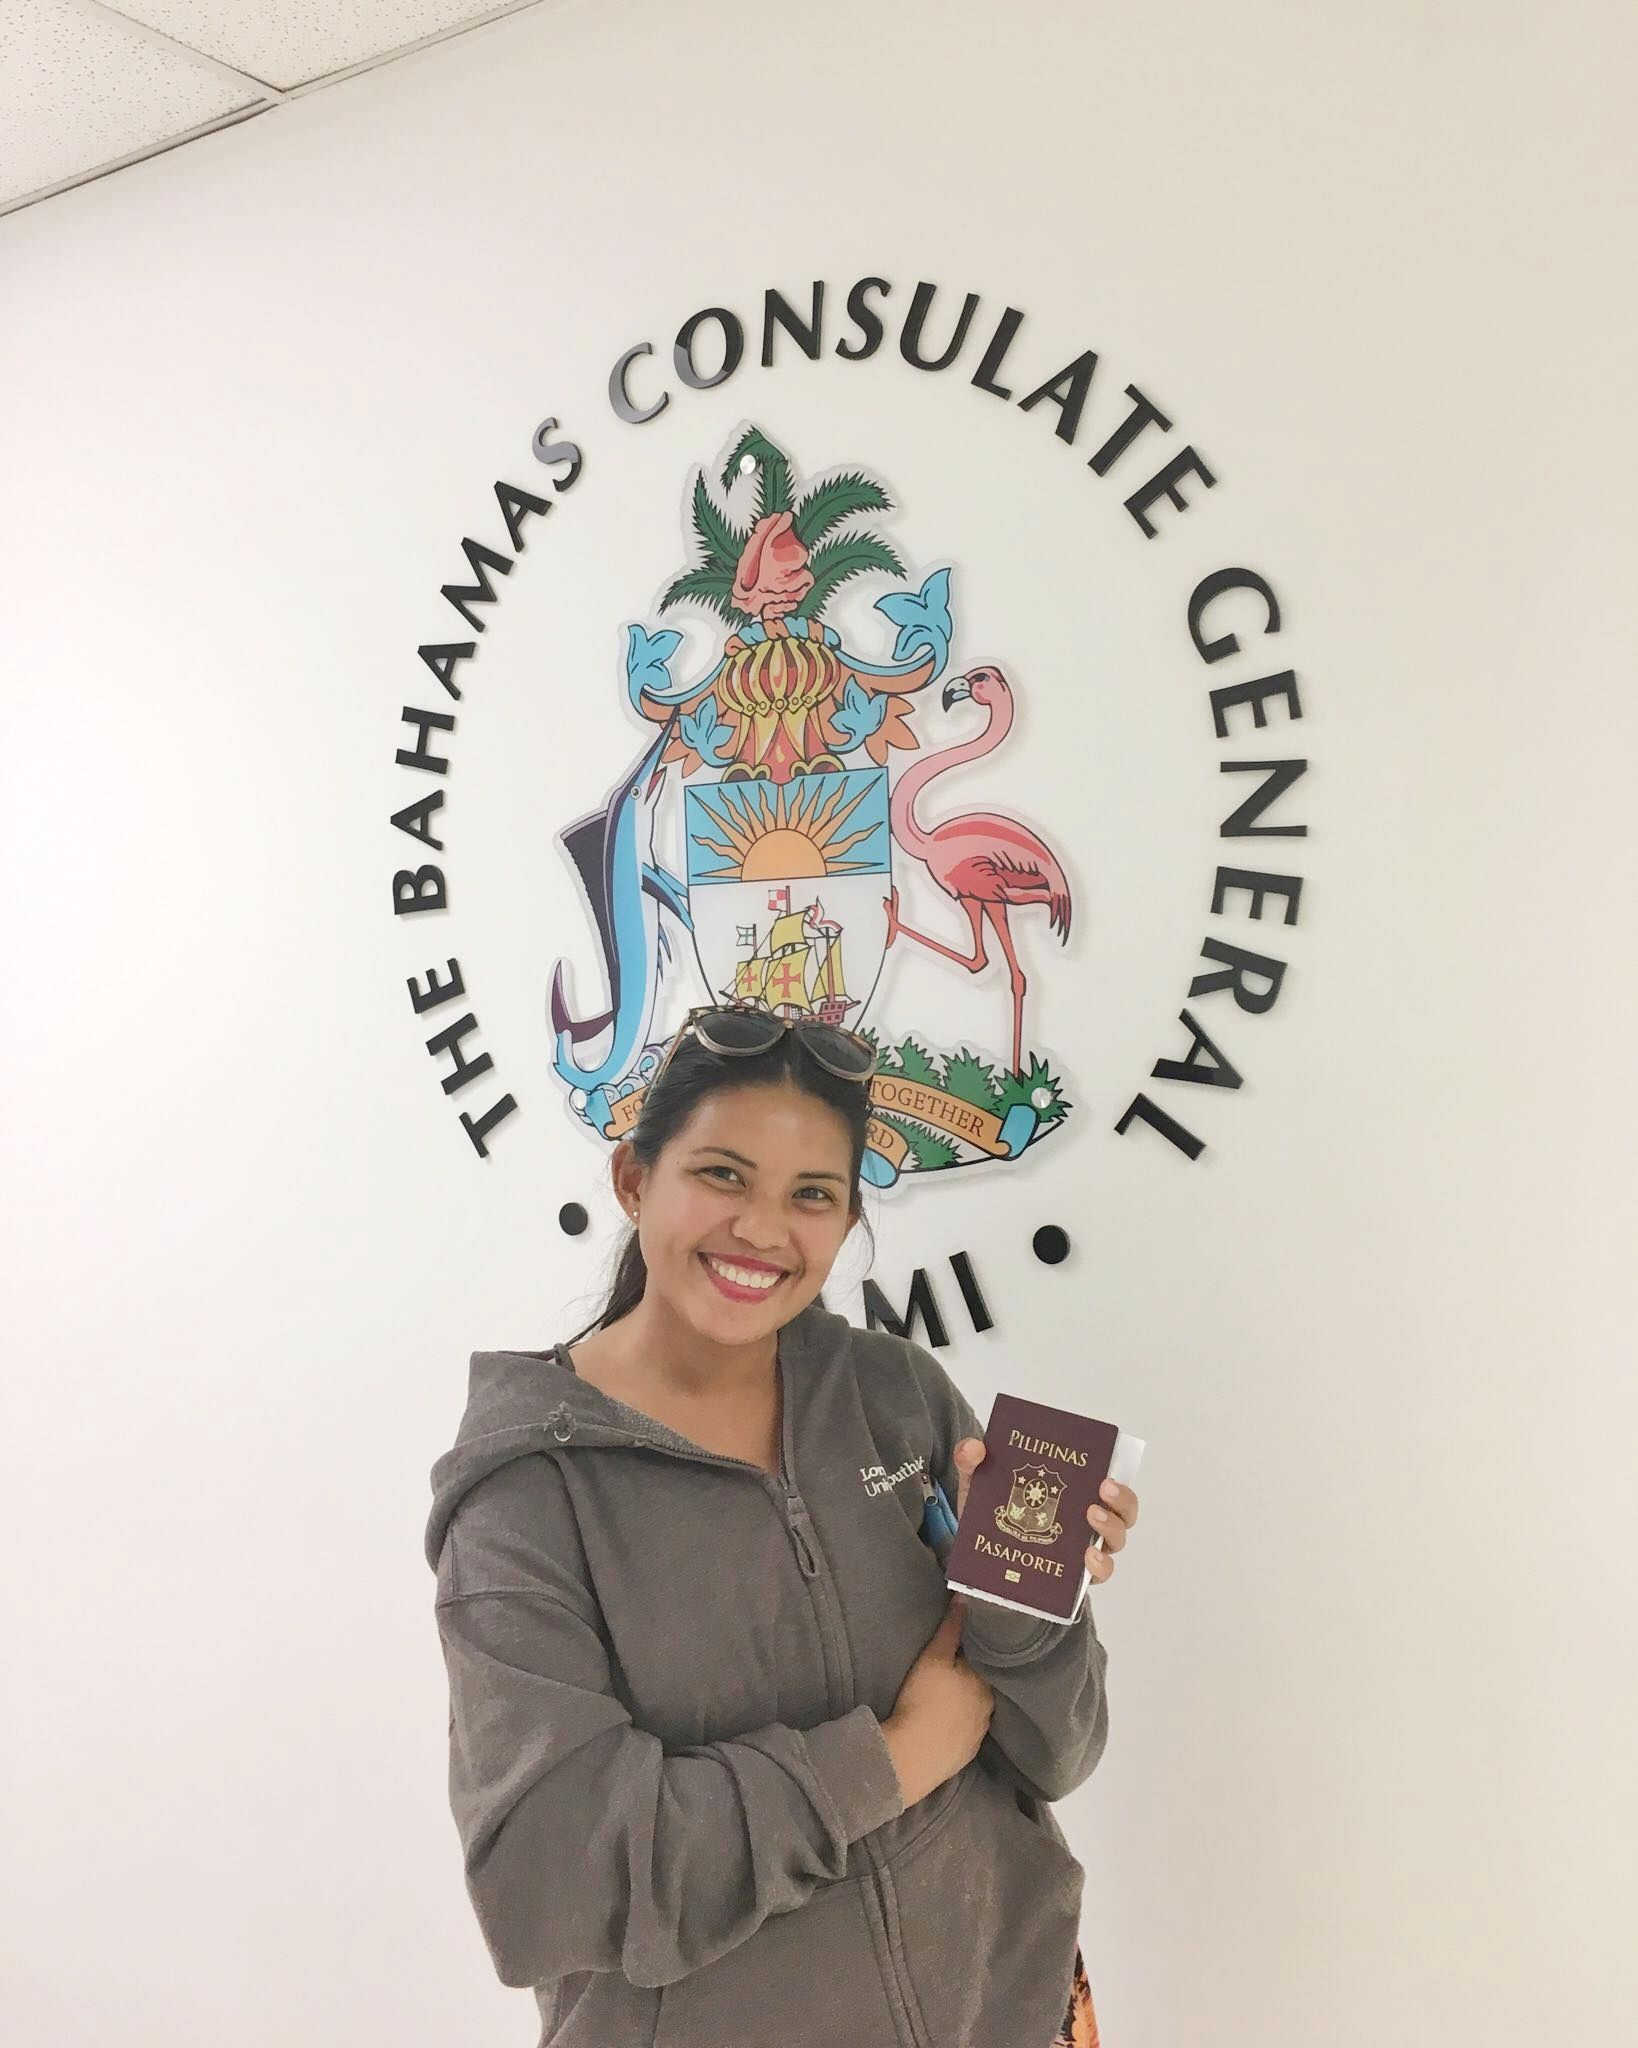 Road Trip to Miami, Florida Getting My Bahamas Visa